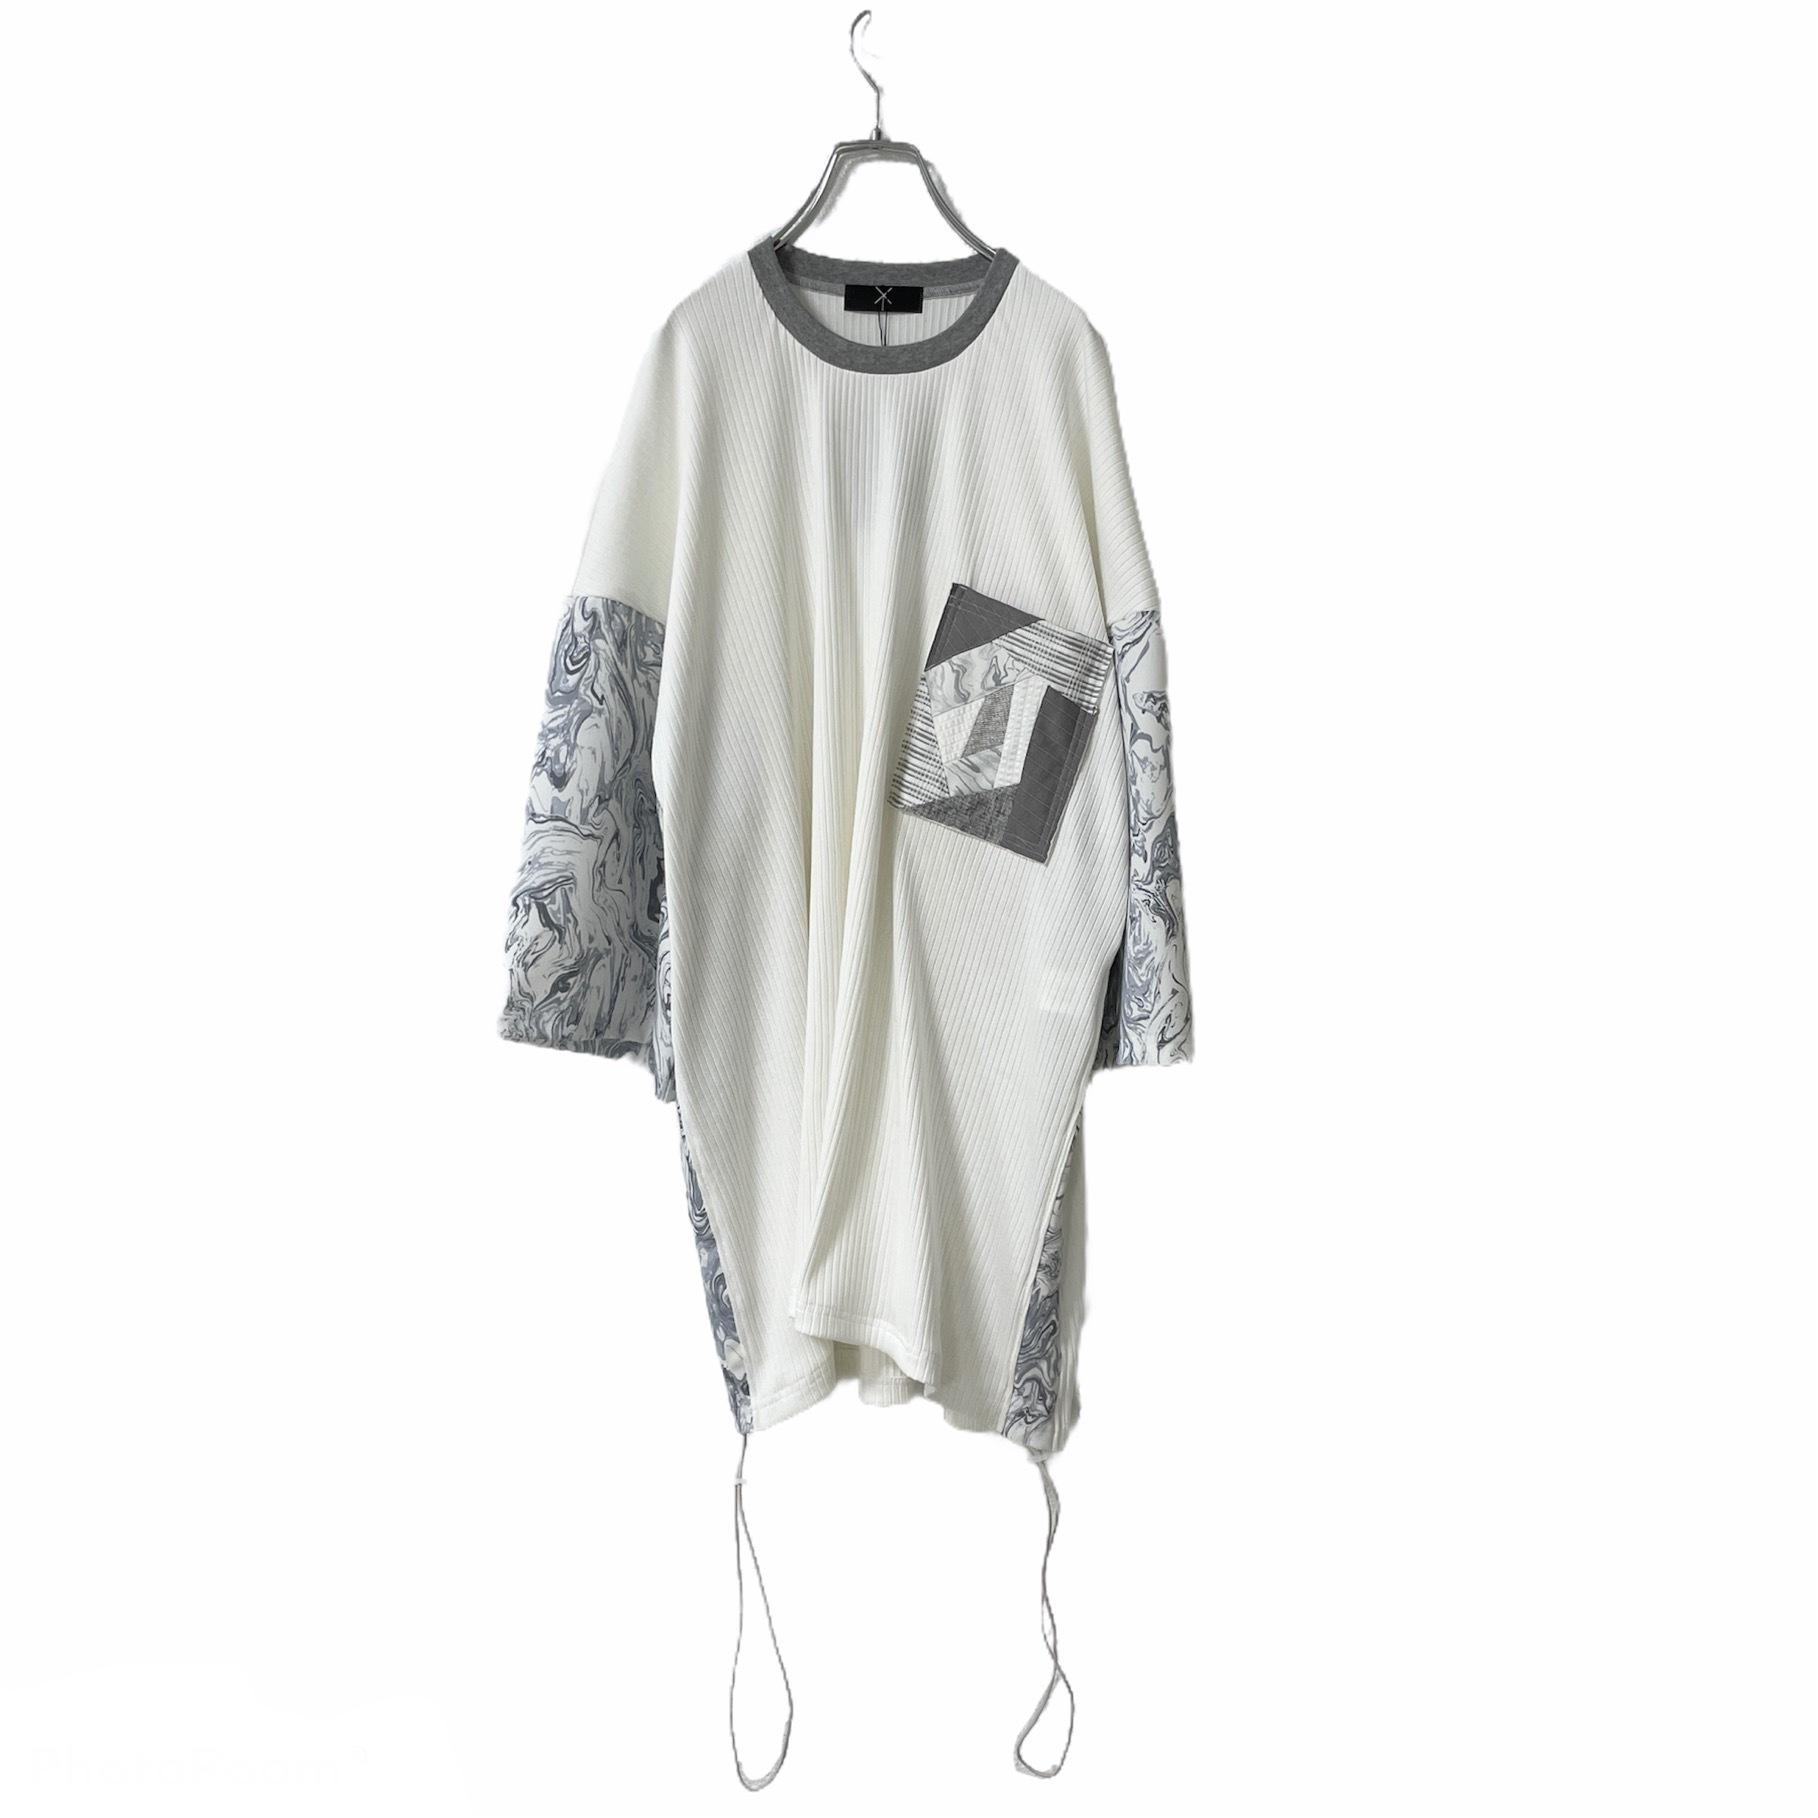 Gather-T-shirts Pocket ( white)